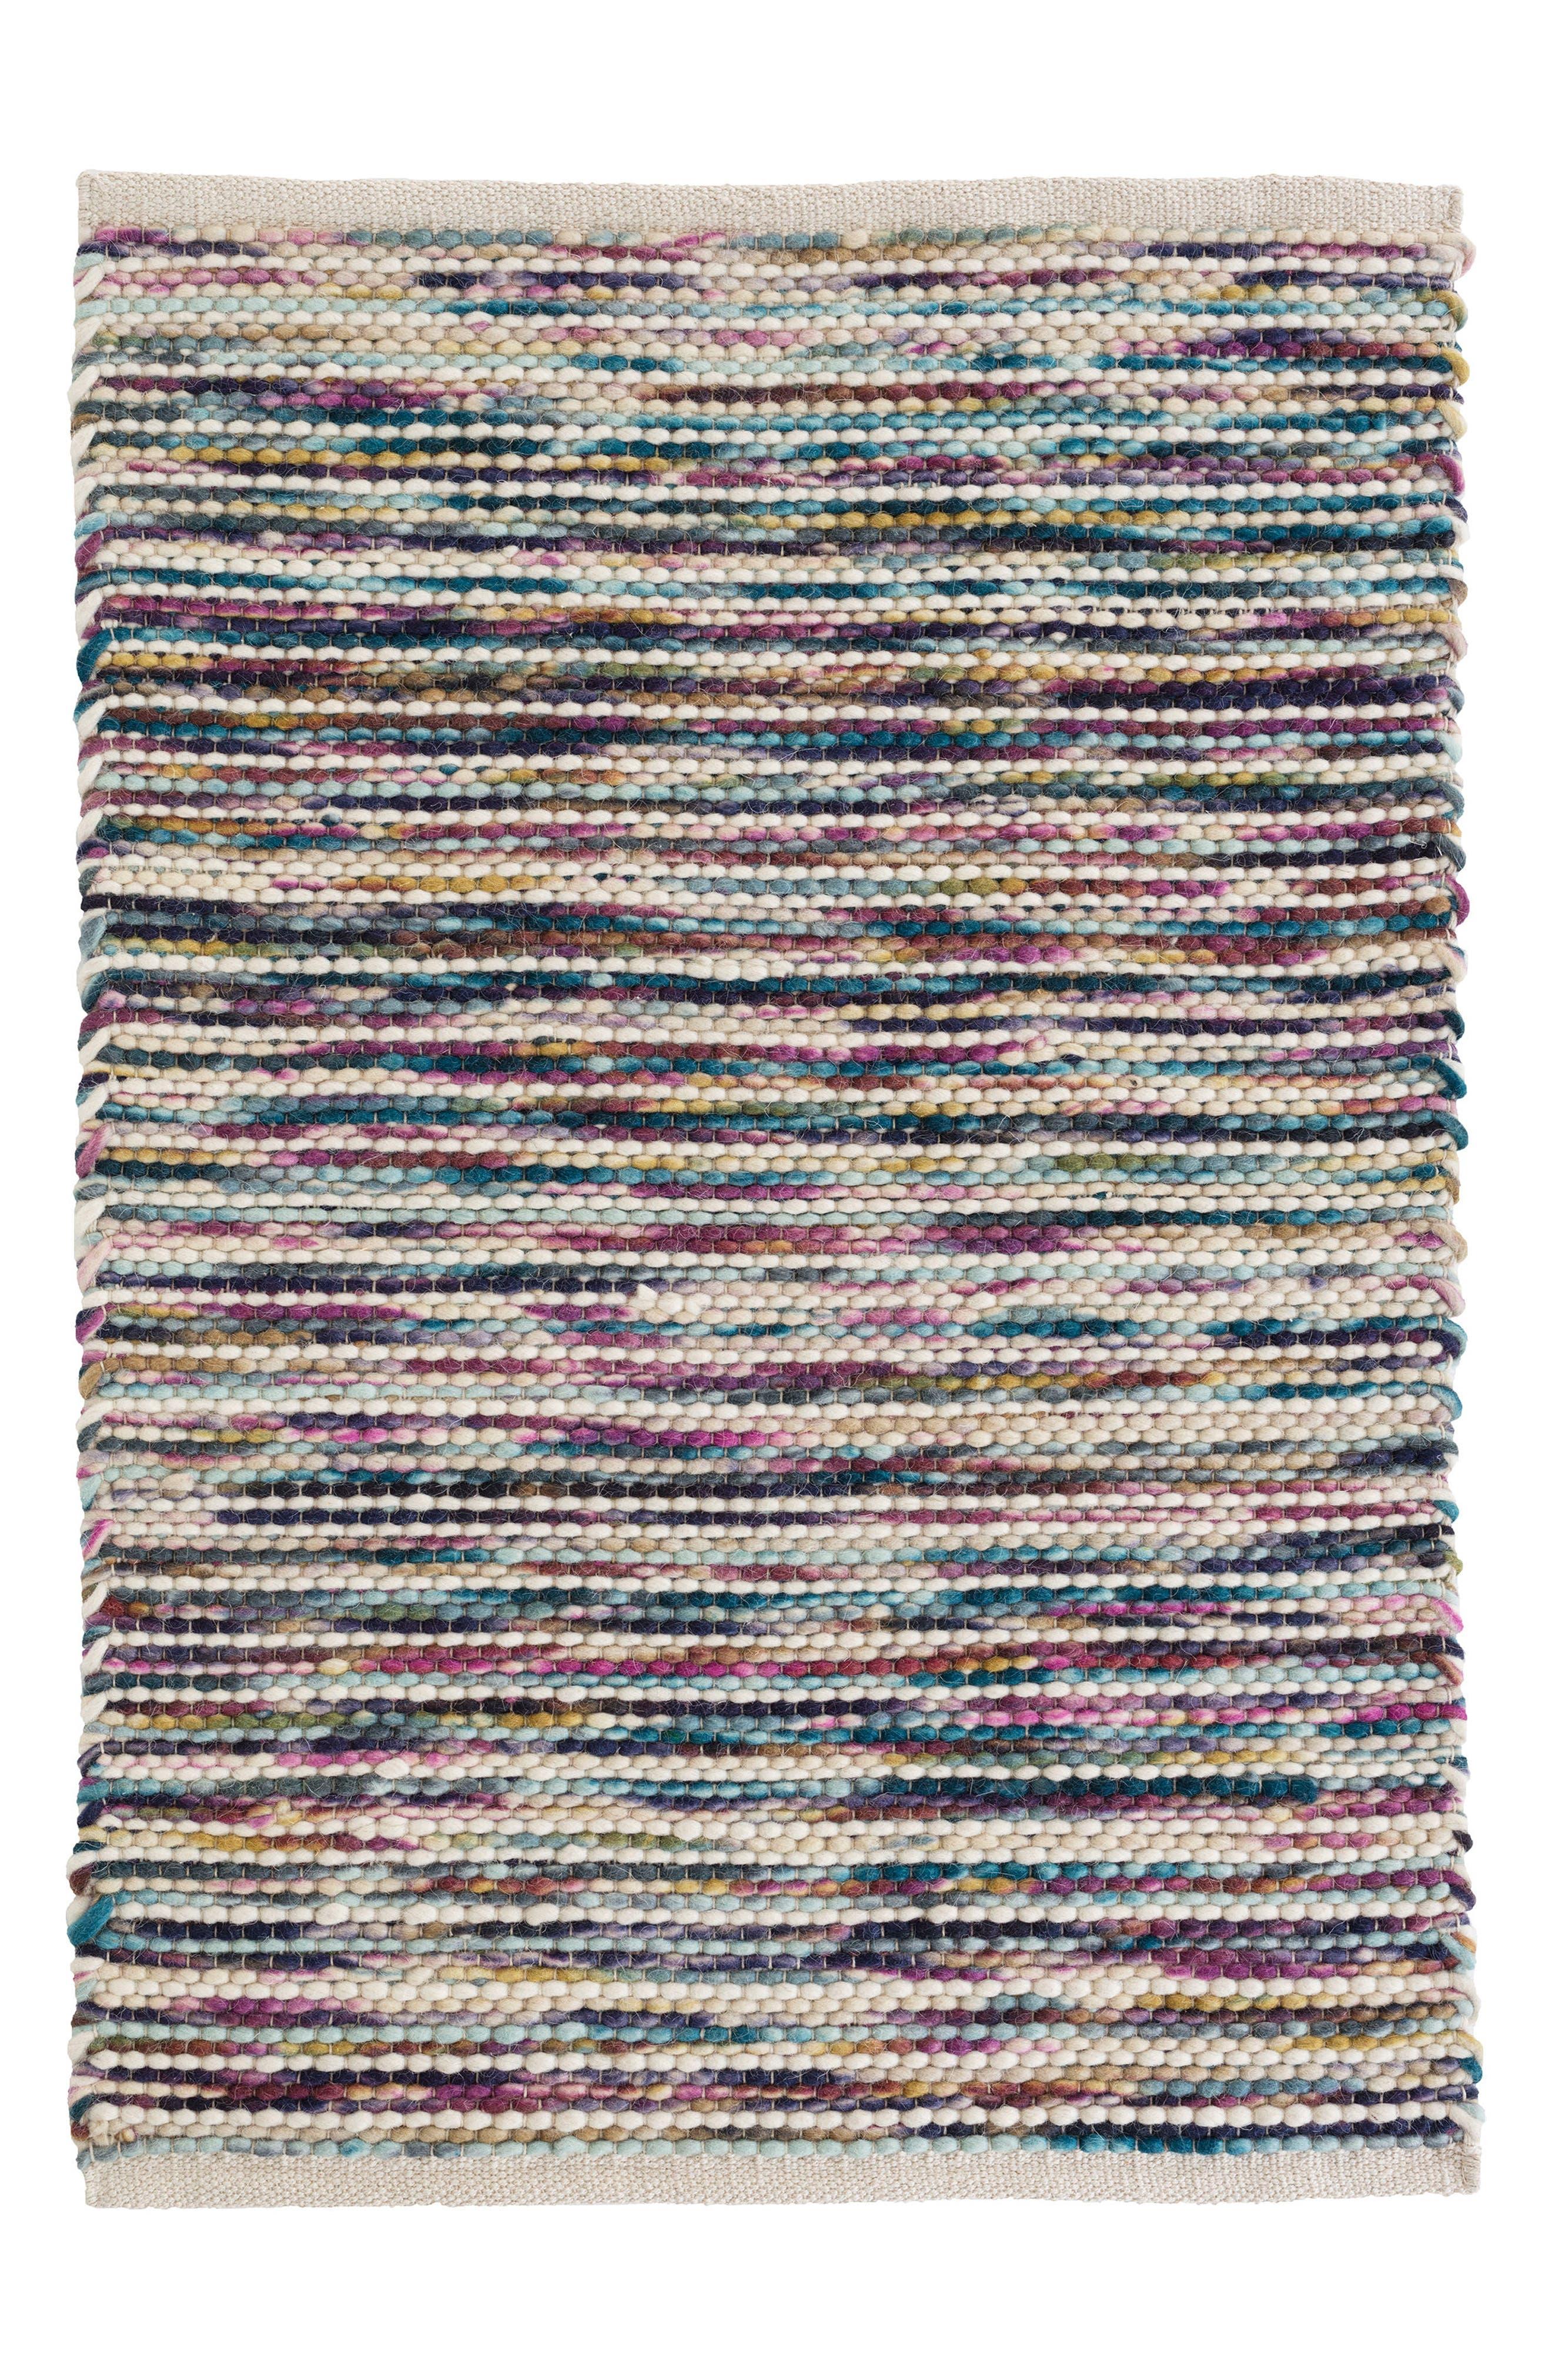 Dash & Albert Lytton Woven Wool Rug